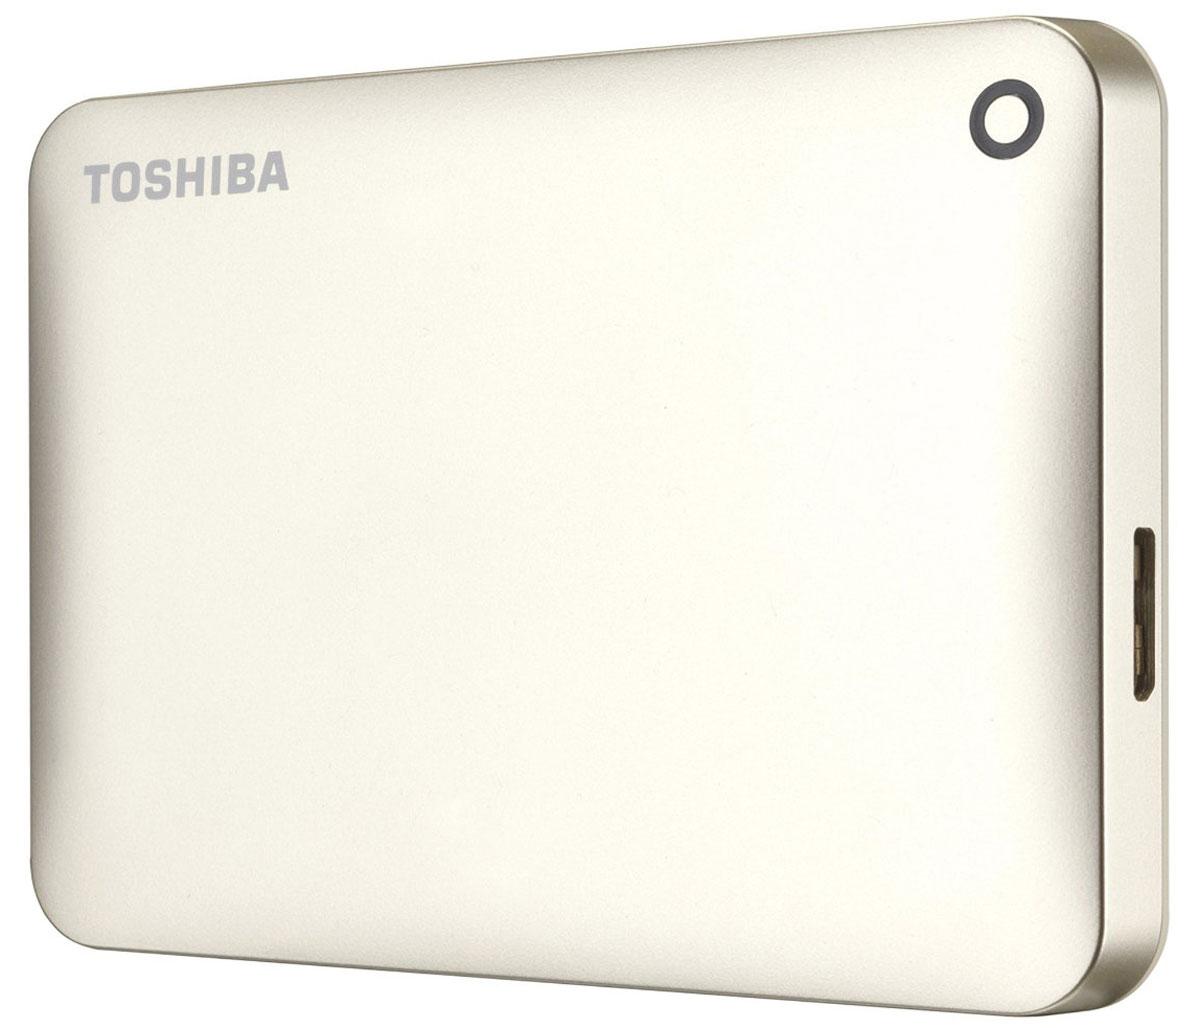 Toshiba Canvio Connect II 1TB, Gold внешний жесткий диск (HDTC810EC3AA) - Носители информации